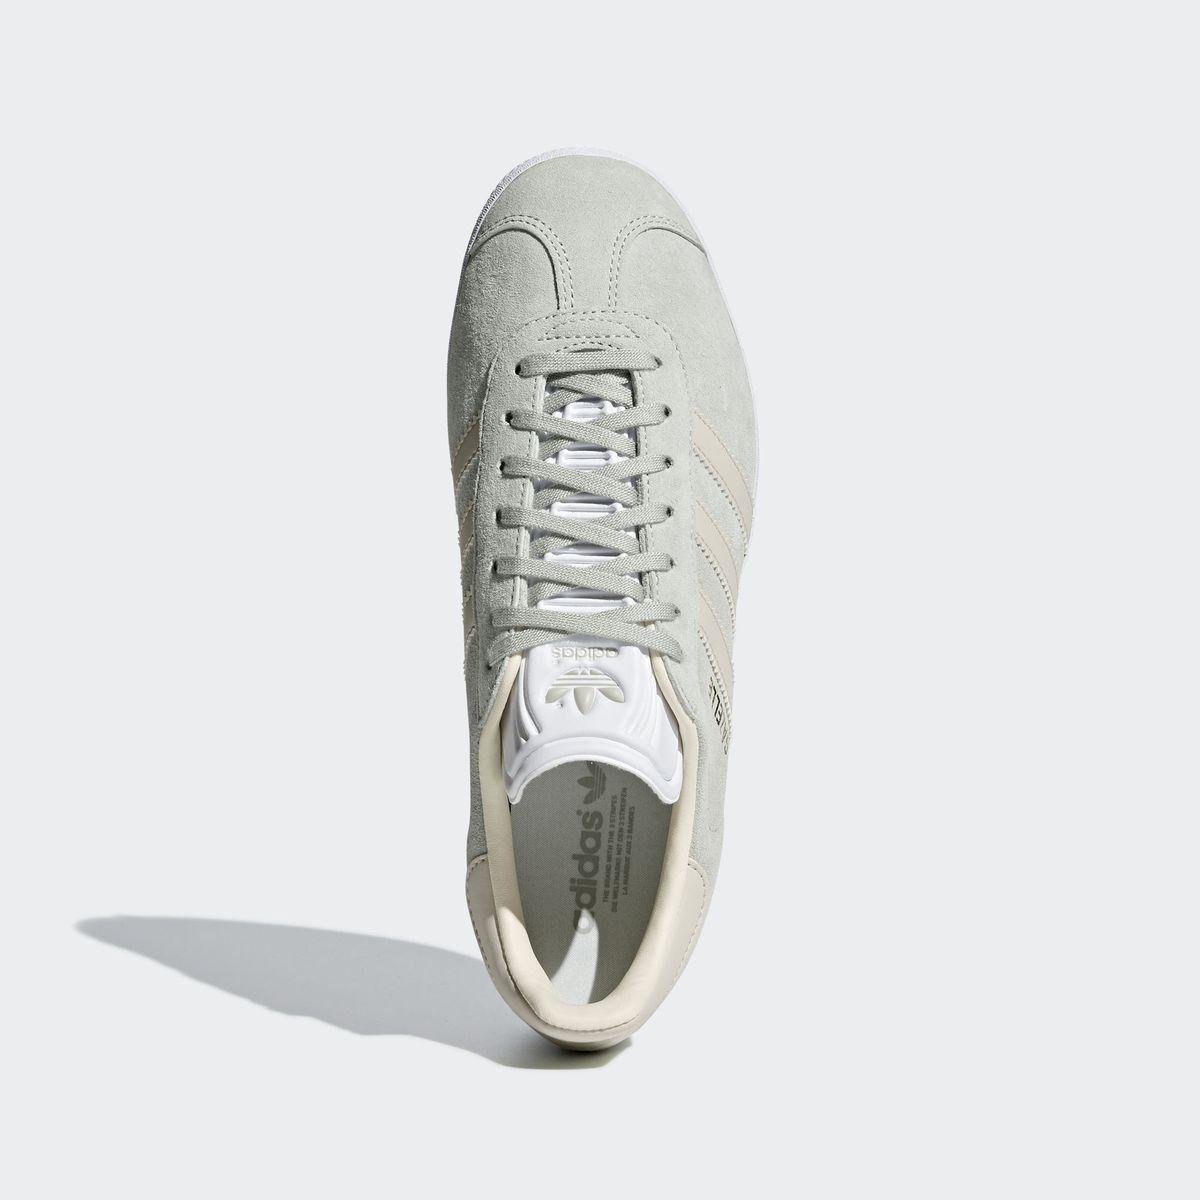 gazelle adidas taille 36 femme